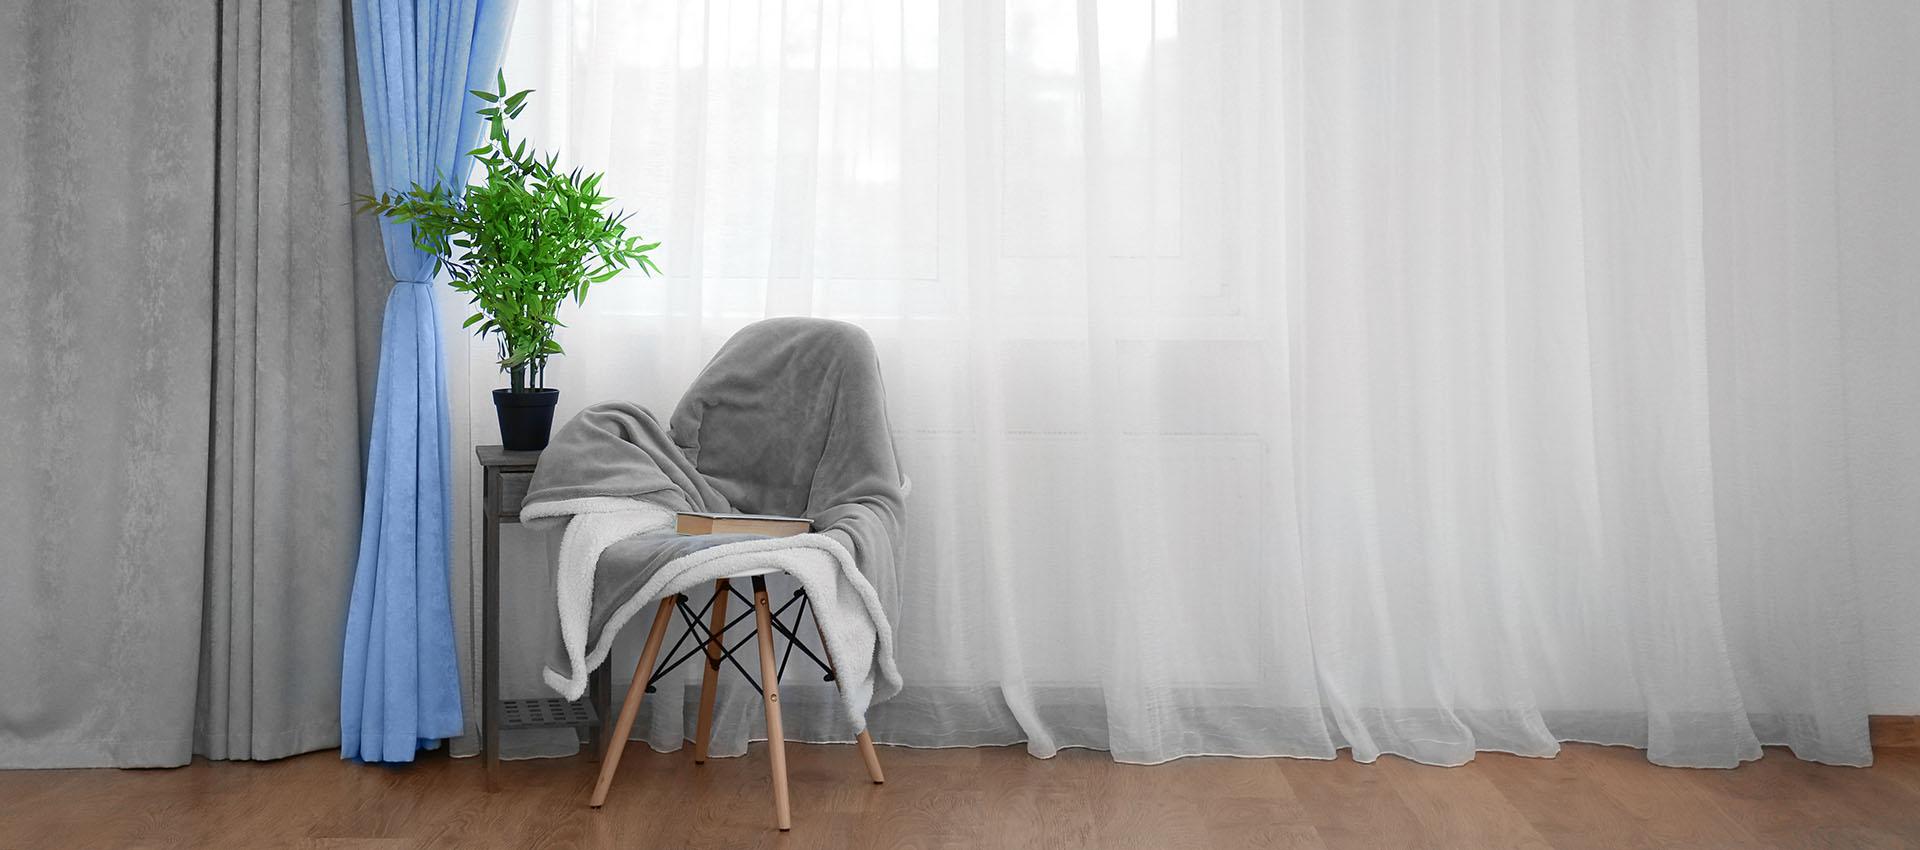 curtain cleaning in mirdif justmop uae